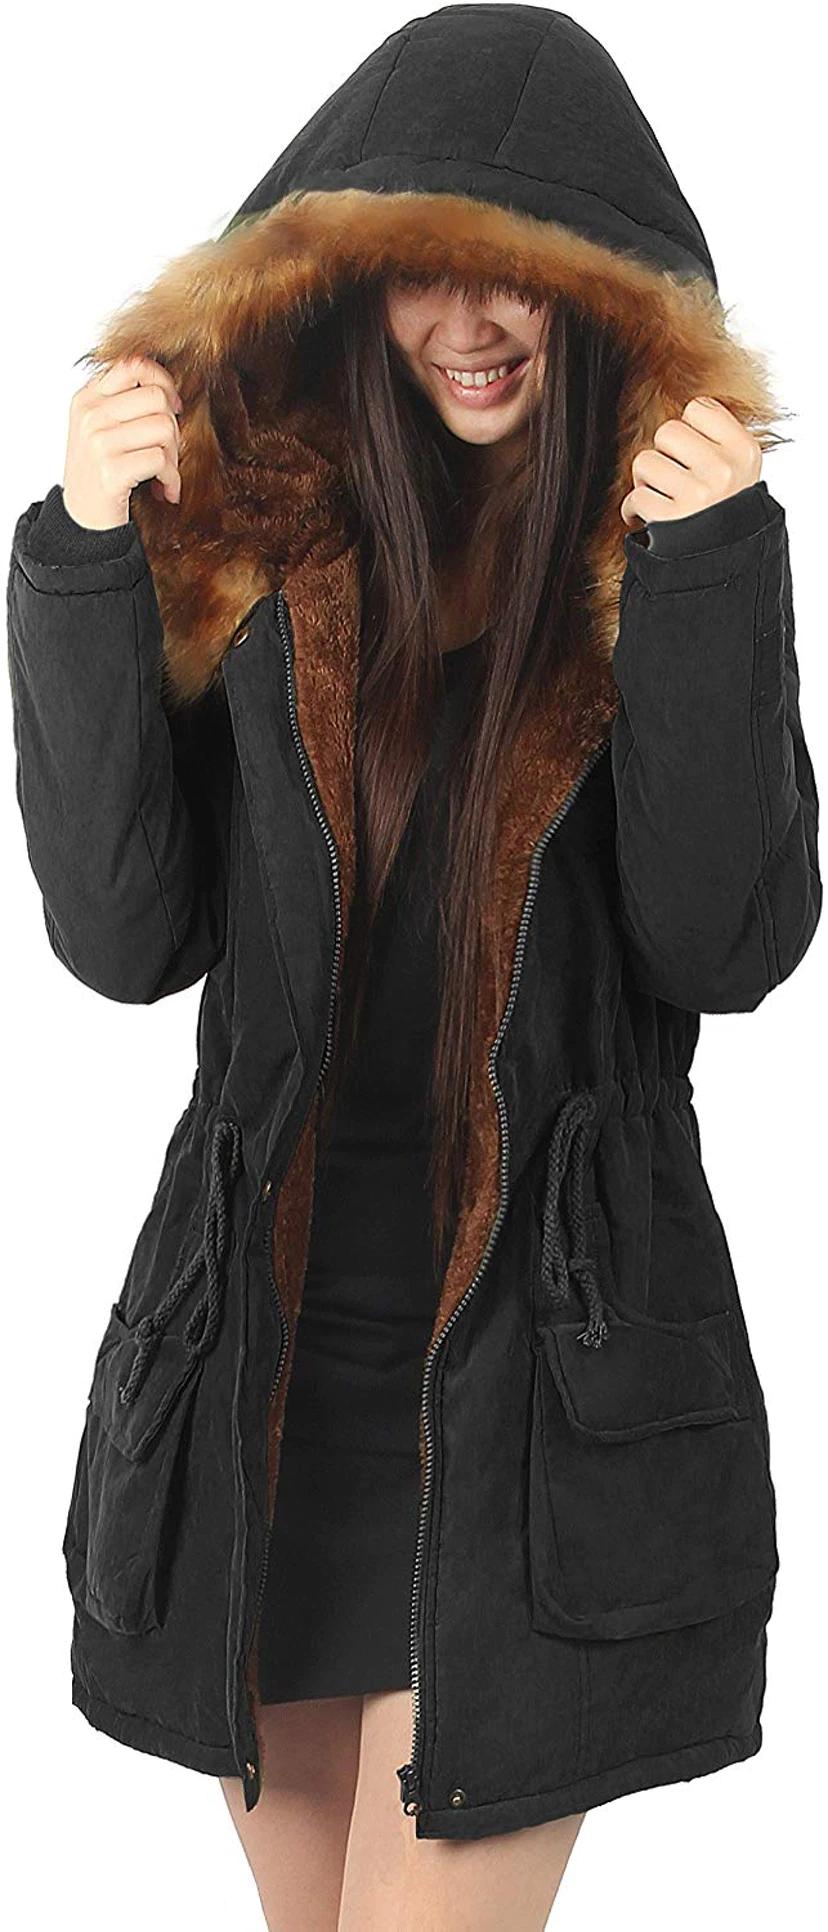 10 Warm Winter Coats Under 100 In Every Style Color Womens Hooded Coat Stylish Winter Jacket Faux Fur Jacket [ 1932 x 828 Pixel ]